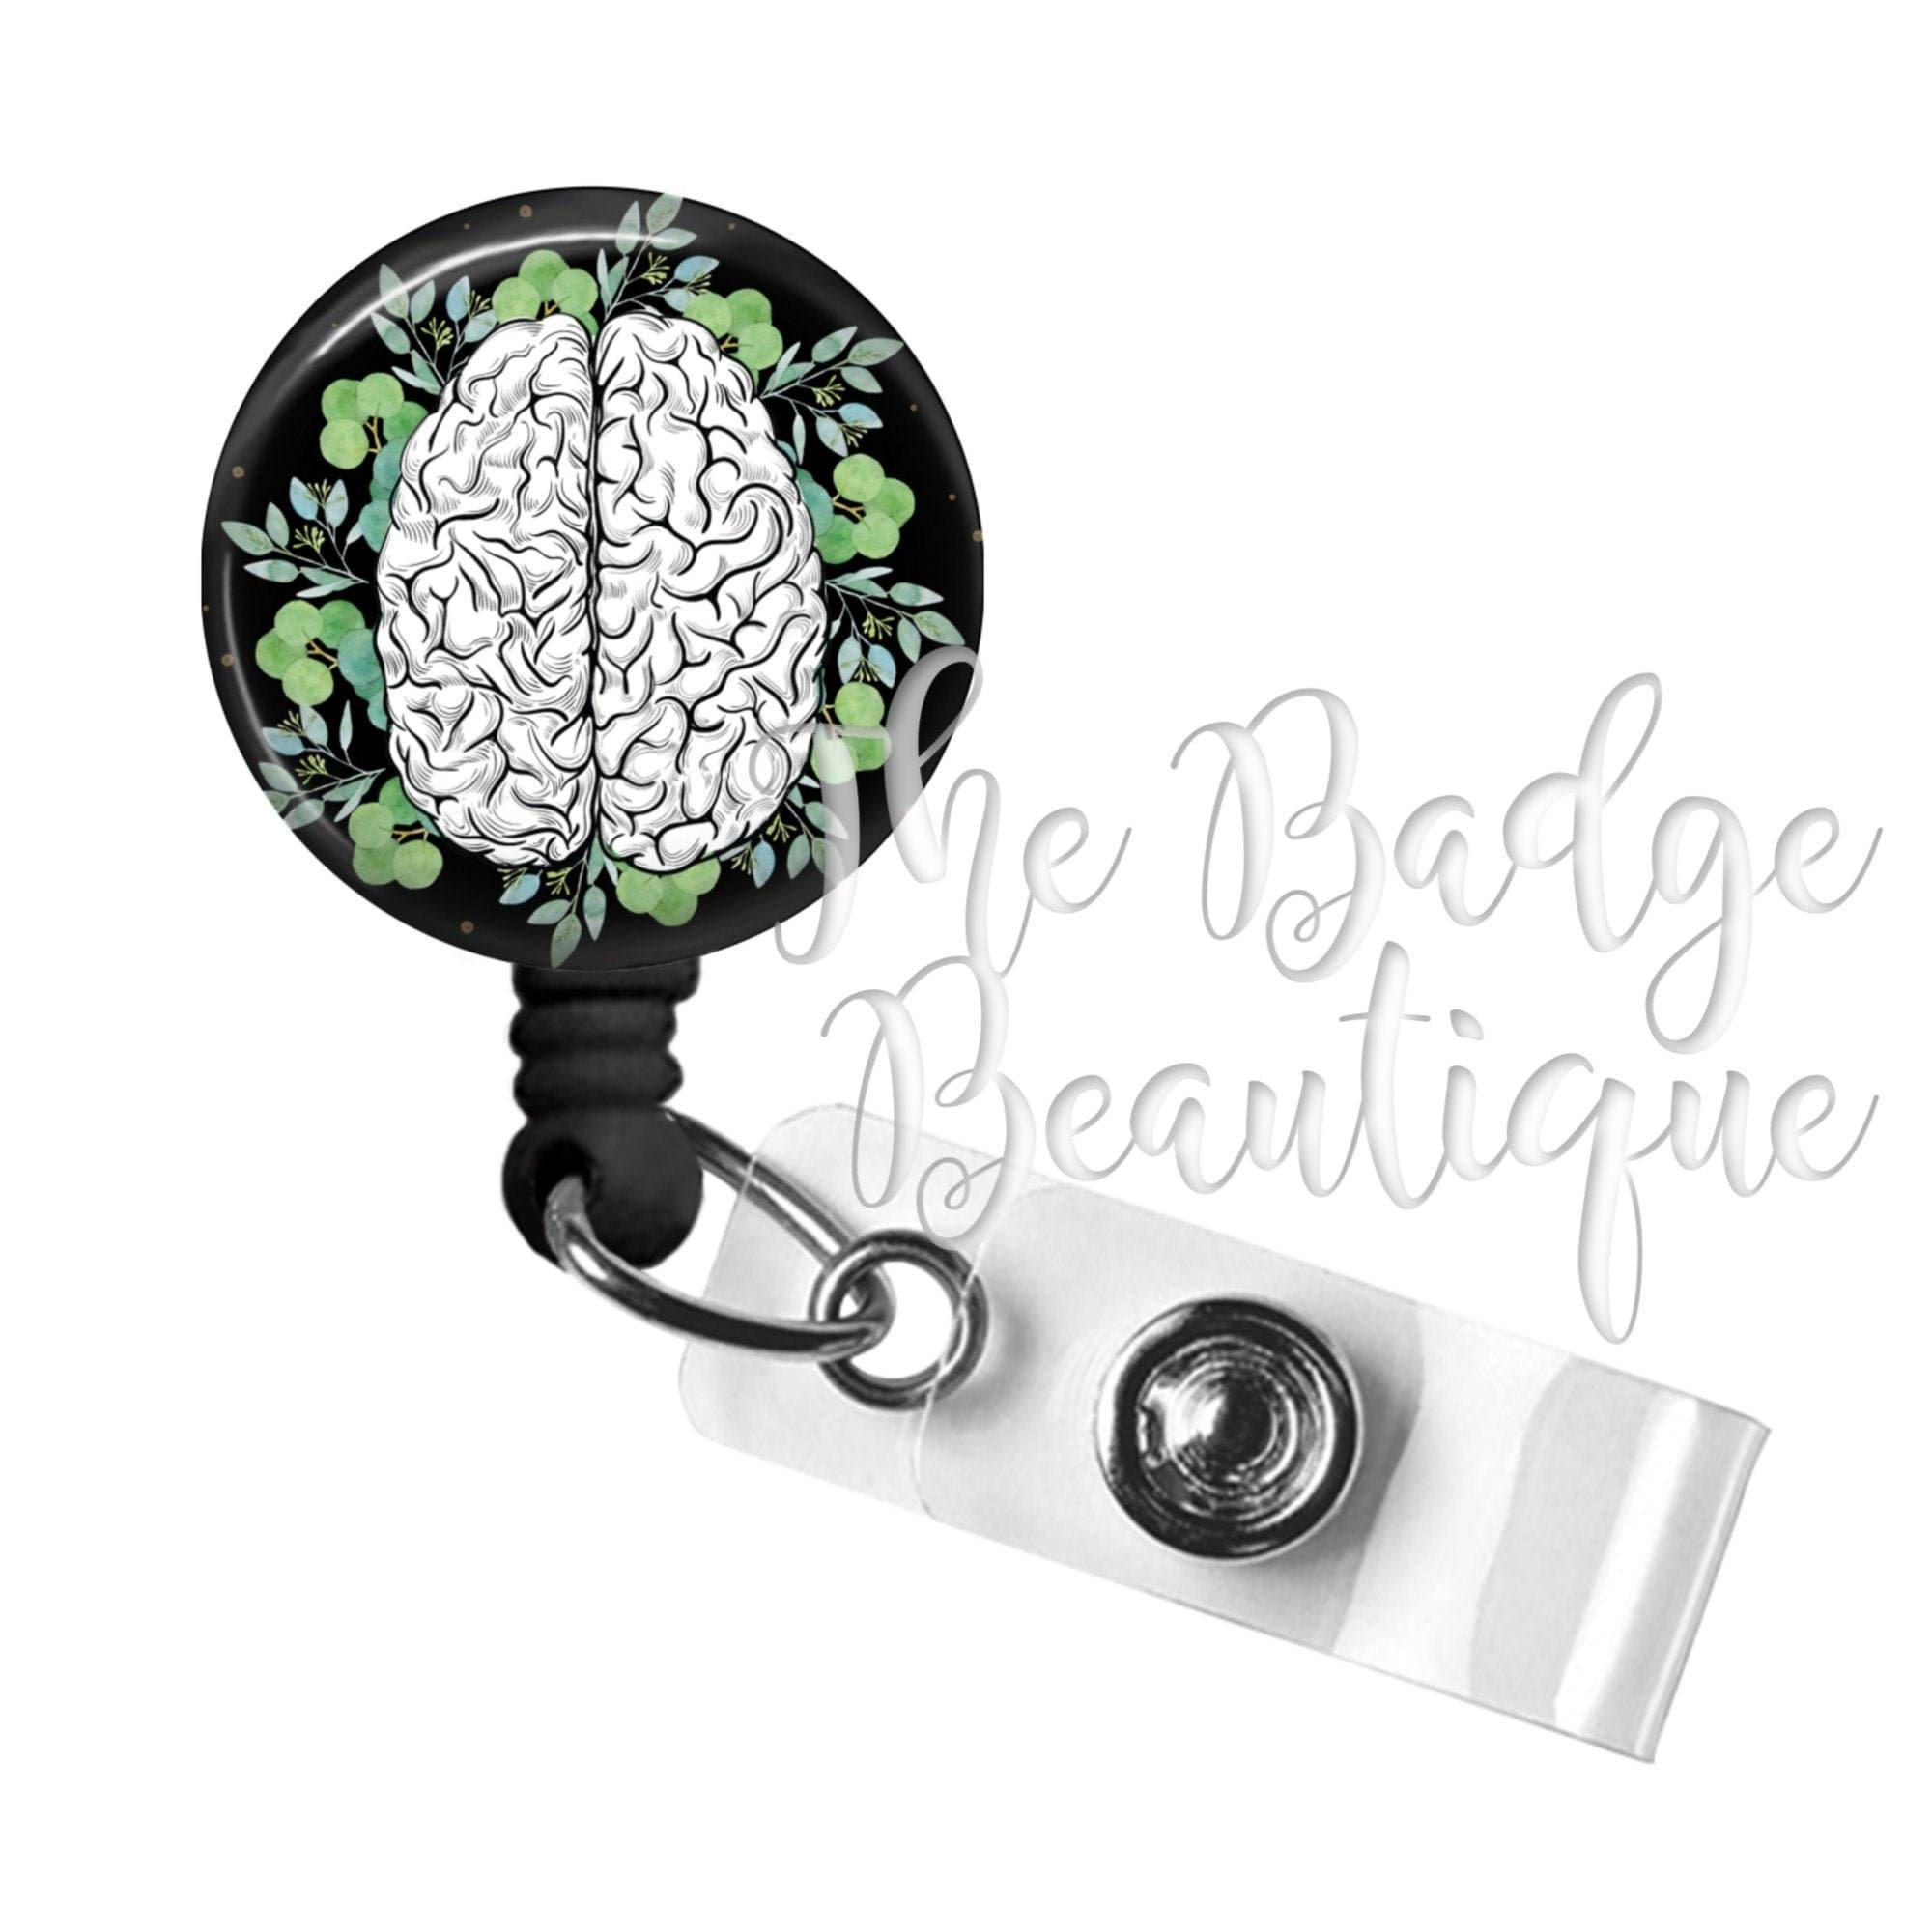 ID Badge Clip Rose Name Badge Neuro Nurse Retractable ID Badge Holder Gift for Neuro Nurse Neurology Name Tag Floral Brain Badge Reel